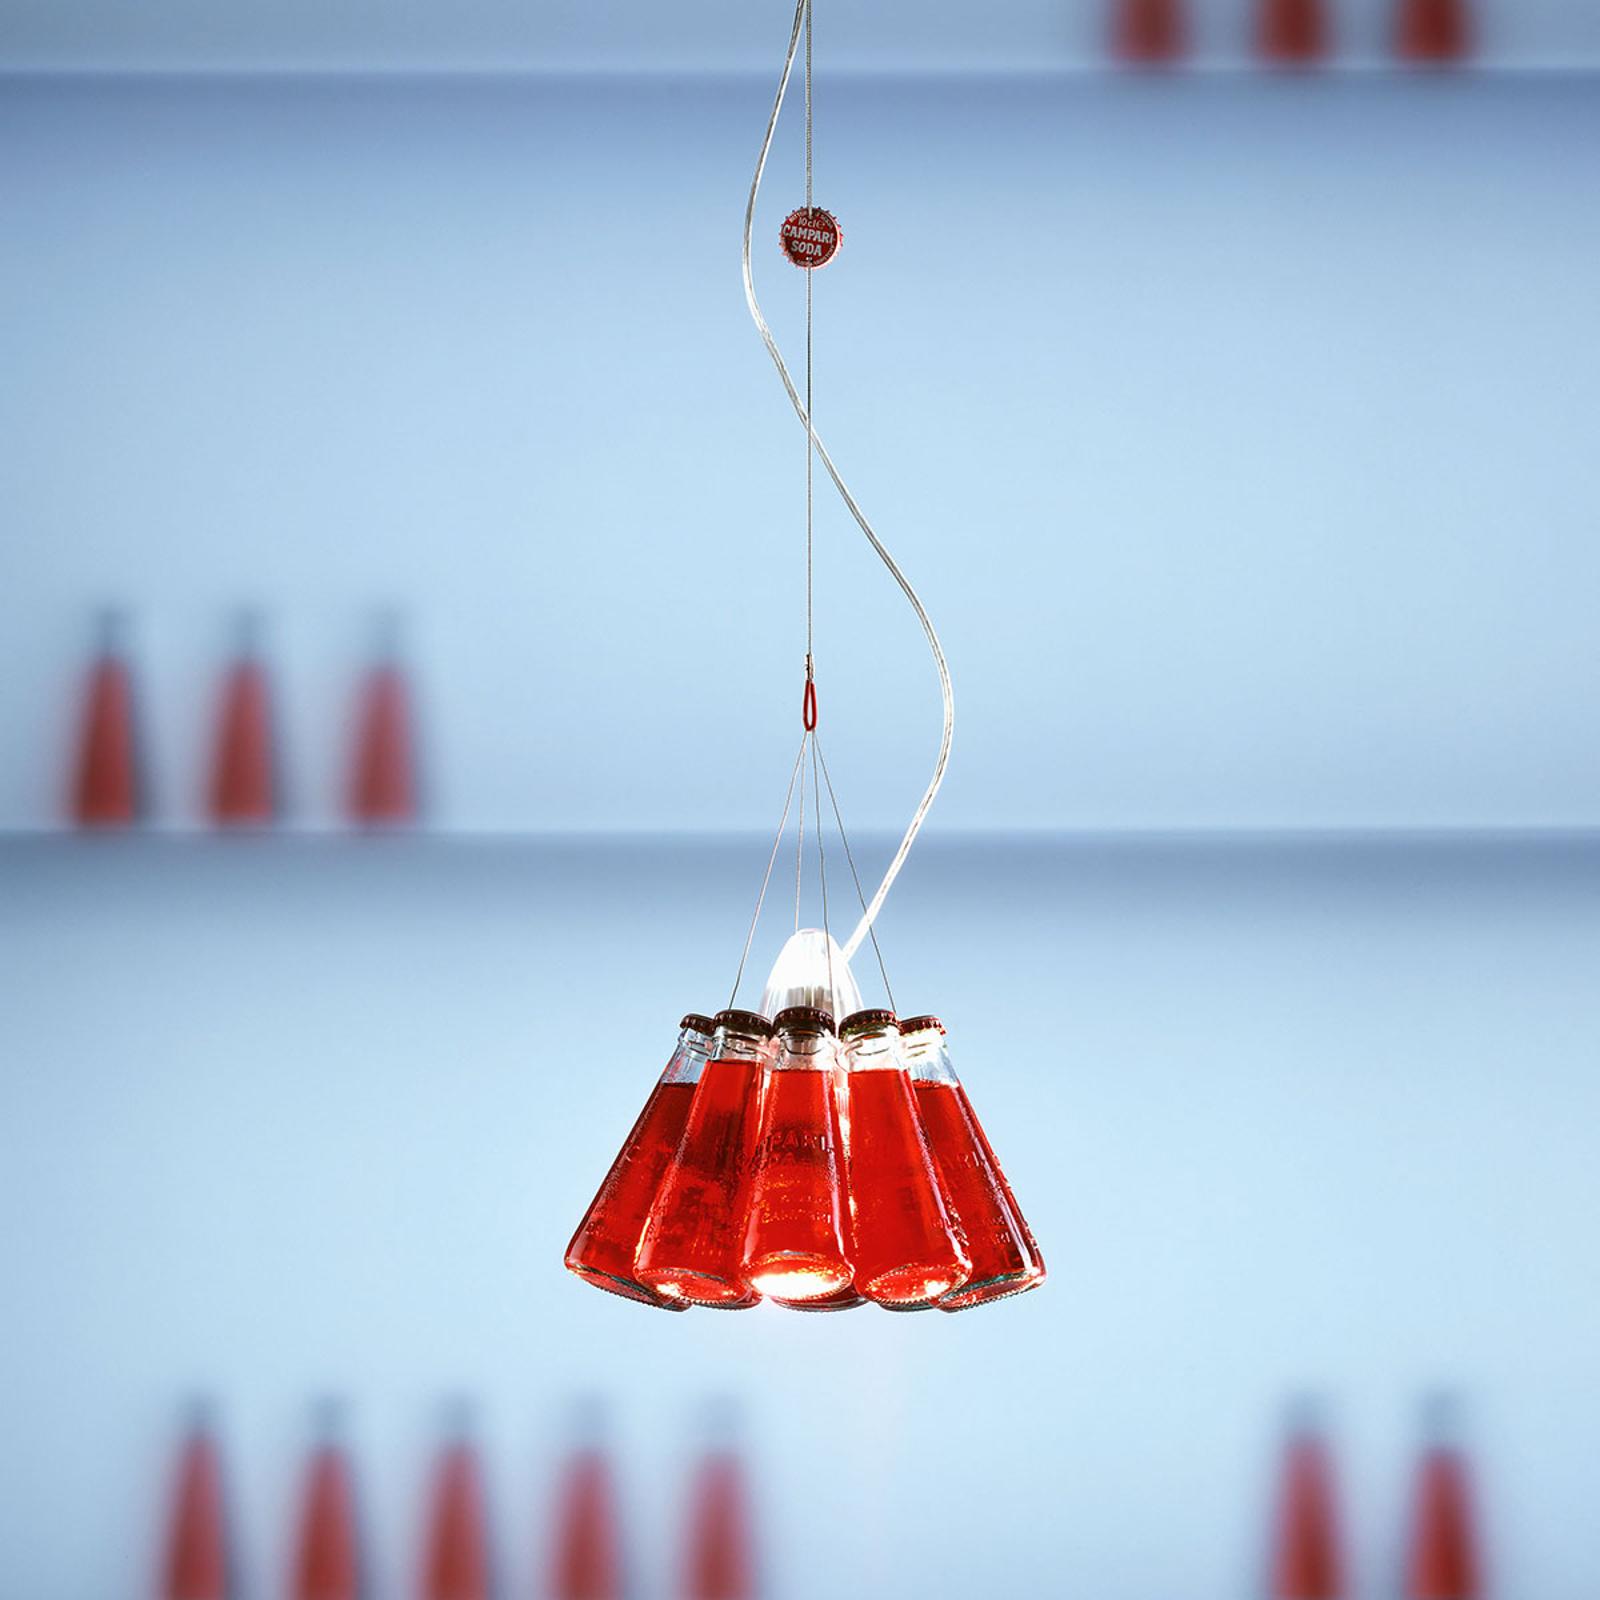 Design hanglamp Campari Light, kabel 155 cm